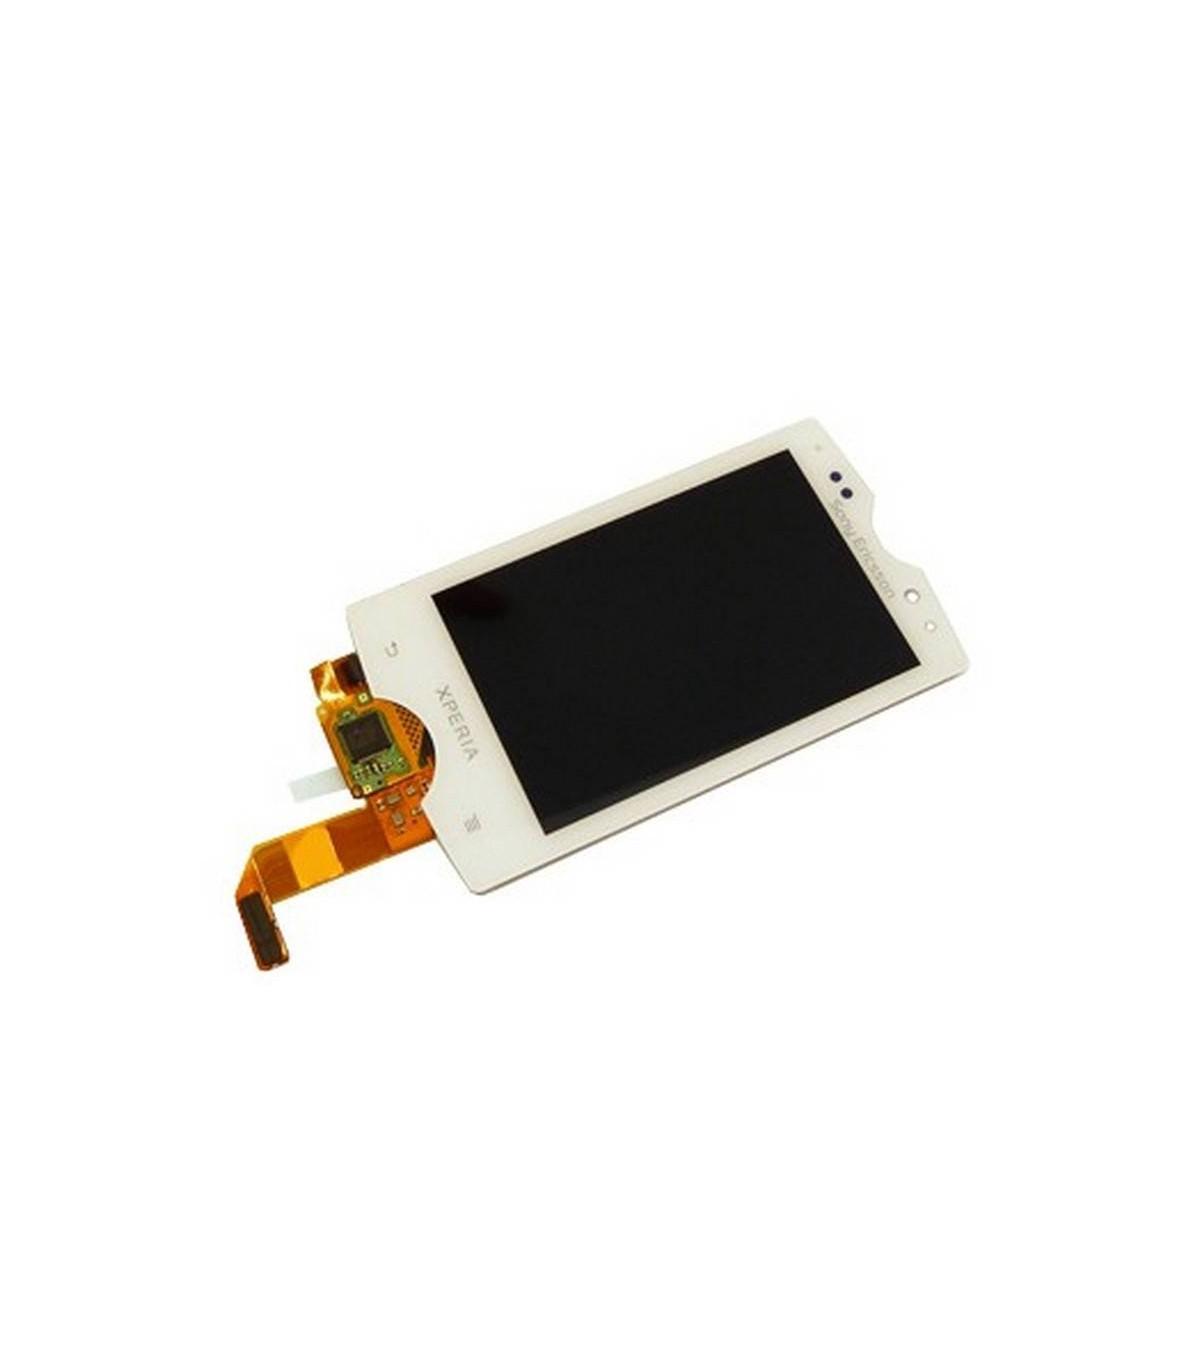 Ecrã Completa tactil+lcd Sony Ericsson Mini Pro SK17i branca